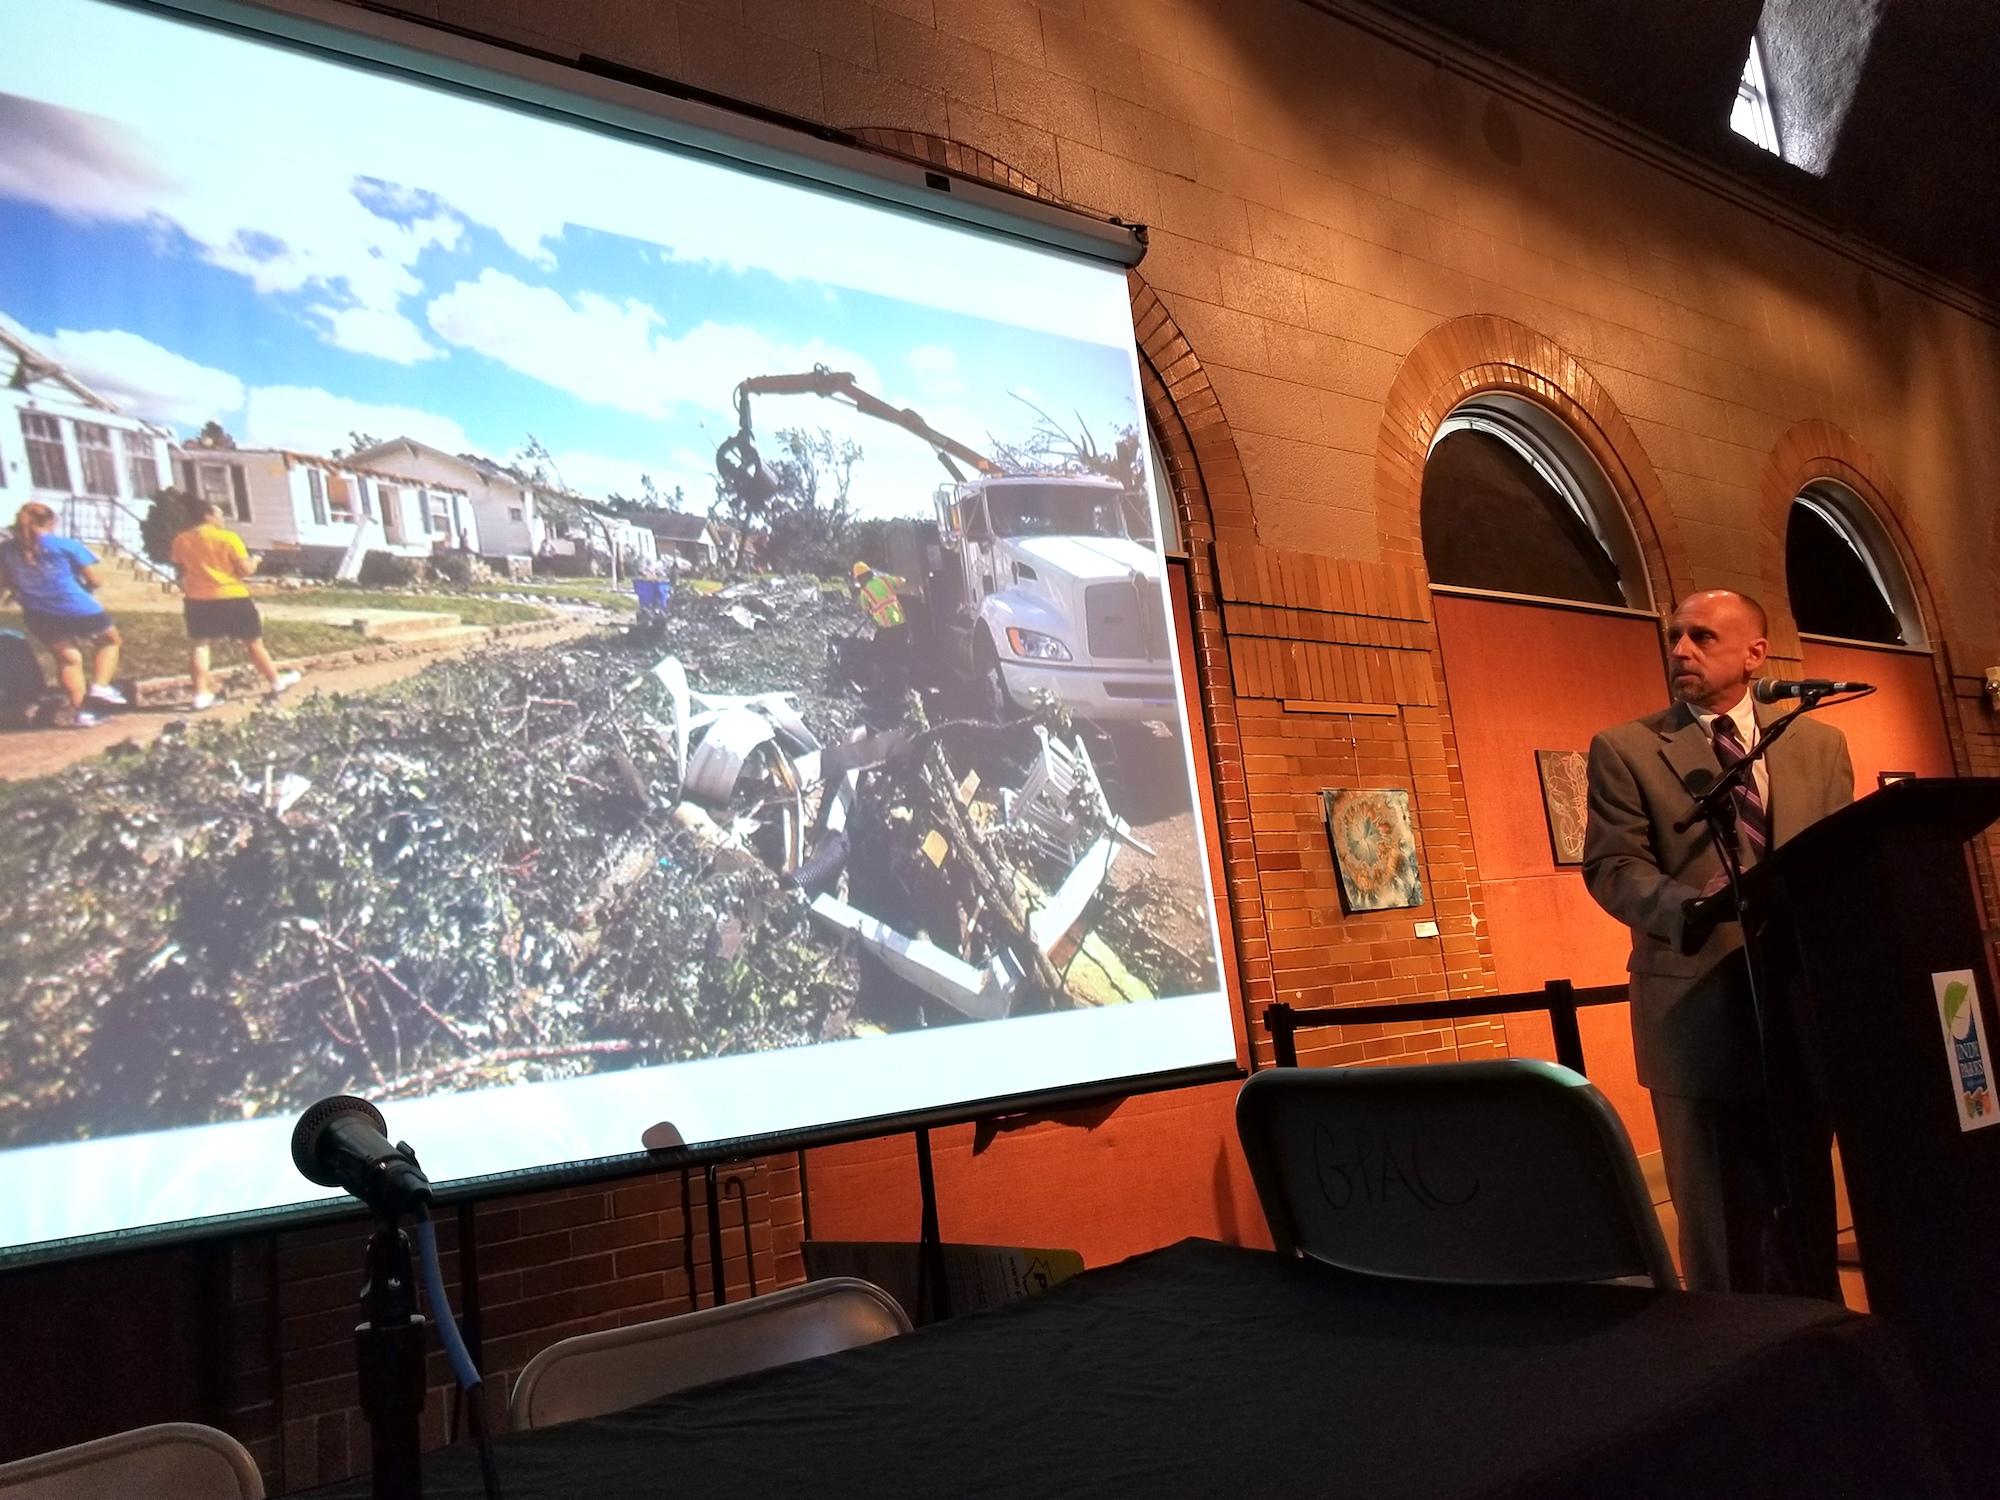 Kokomo Mayor Greg Goodnight shares images of the tornado that struck his city during last year's inaugural Climate Leadership Summit.